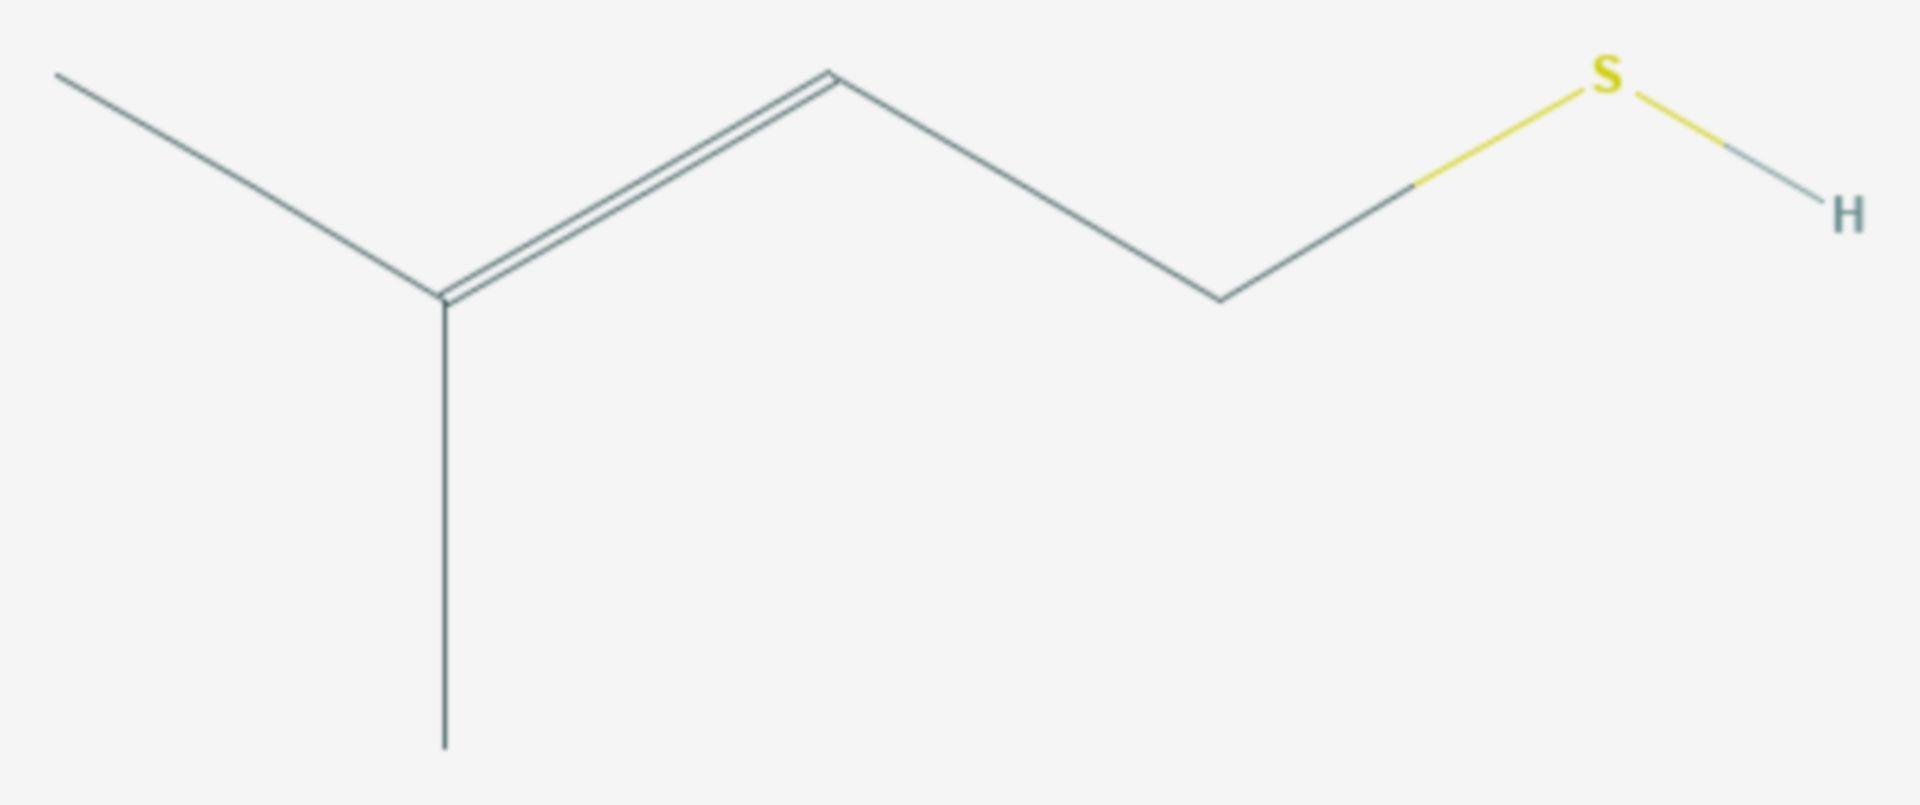 3-Methyl-2-buten-1-thiol (Strukturformel)